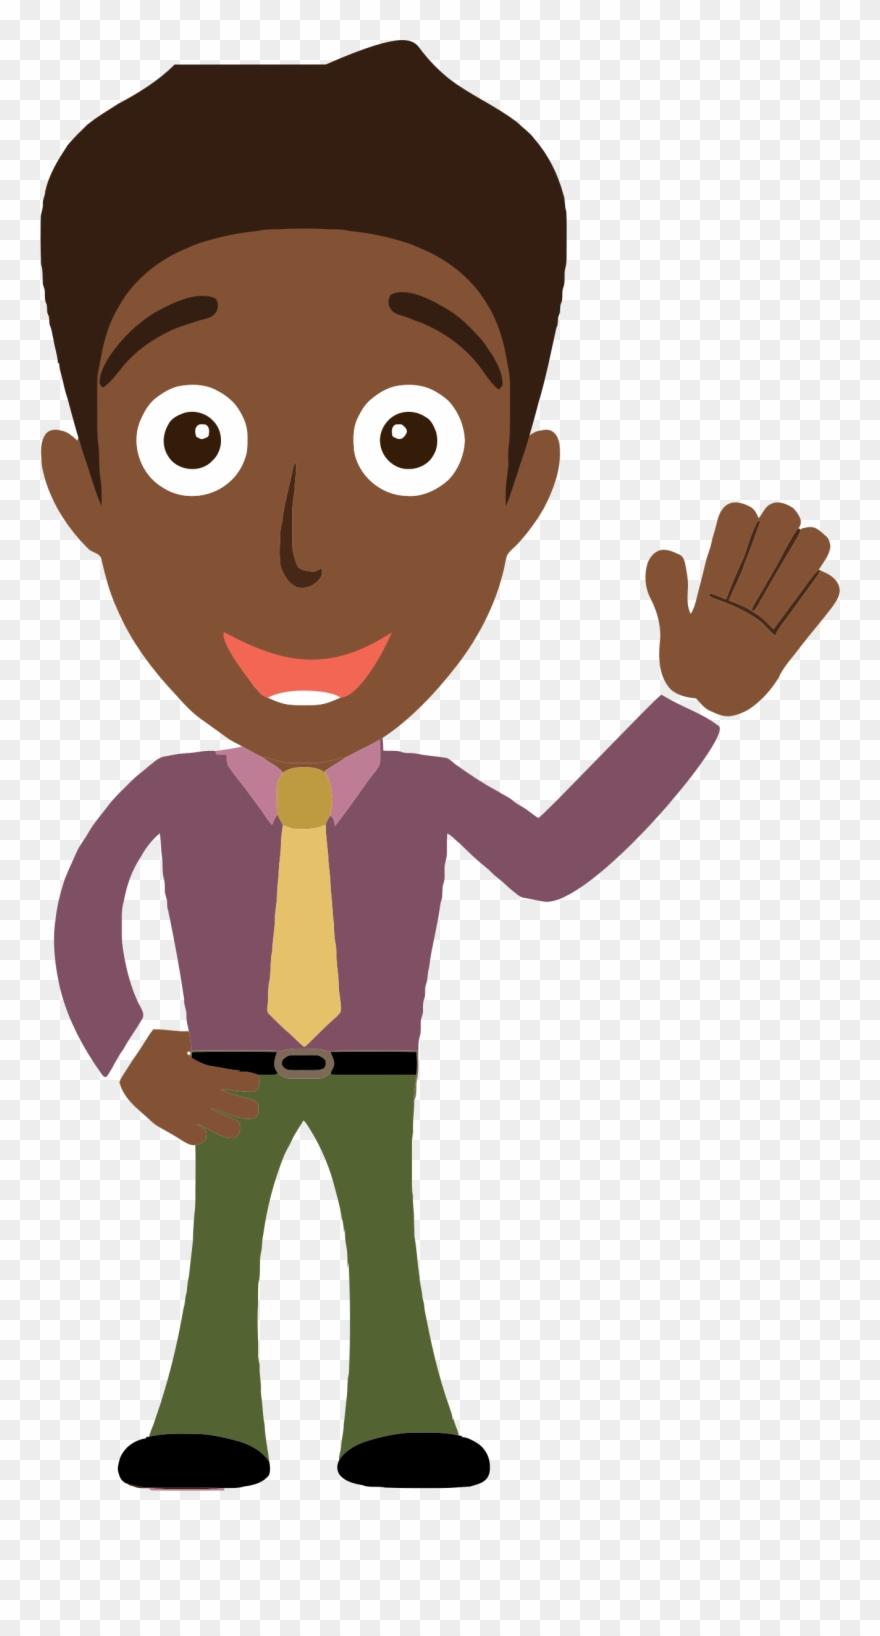 Clipart person png clip freeuse Sensational Idea Person Clip Art Clipart - Cartoon Man Saying Hello ... clip freeuse